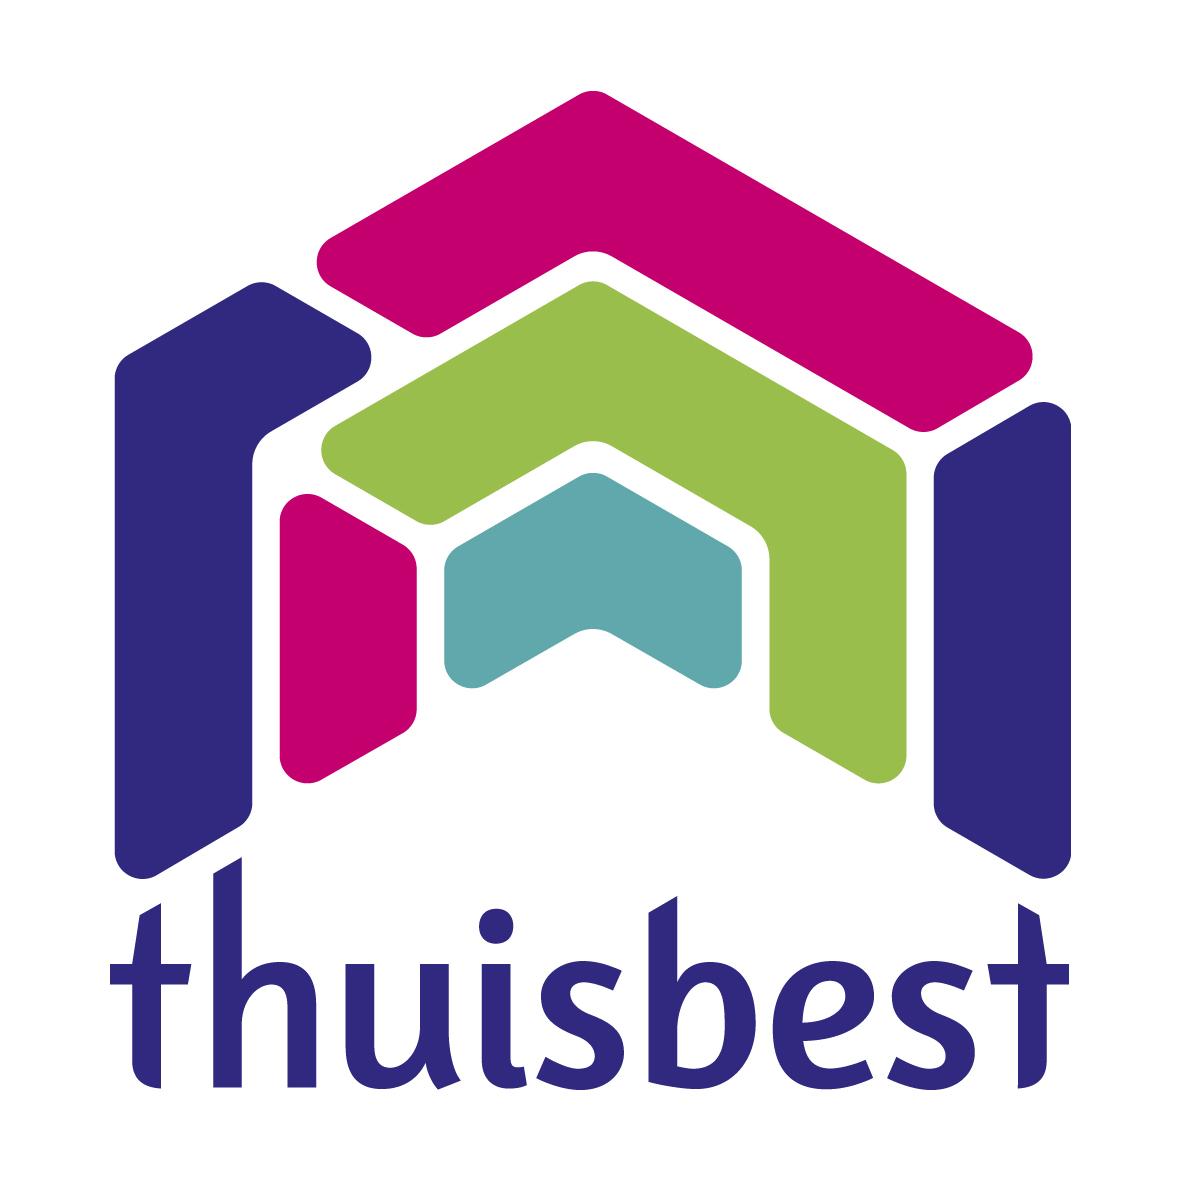 ThuisBest